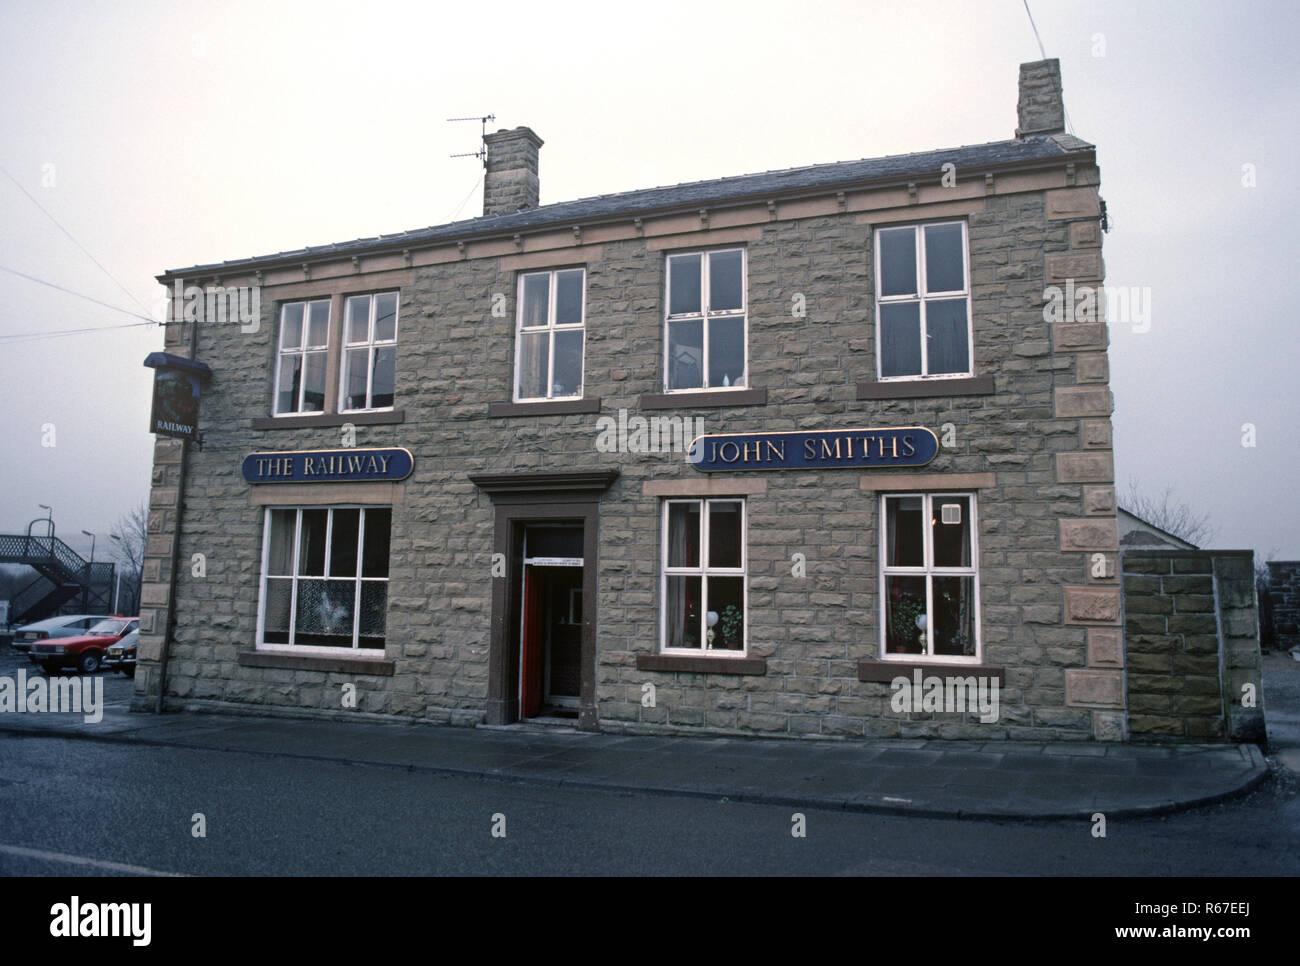 Railway Inn at Huncoat on the British Rail Preston to Colne railway line, Lancashire, Great Britain - Stock Image